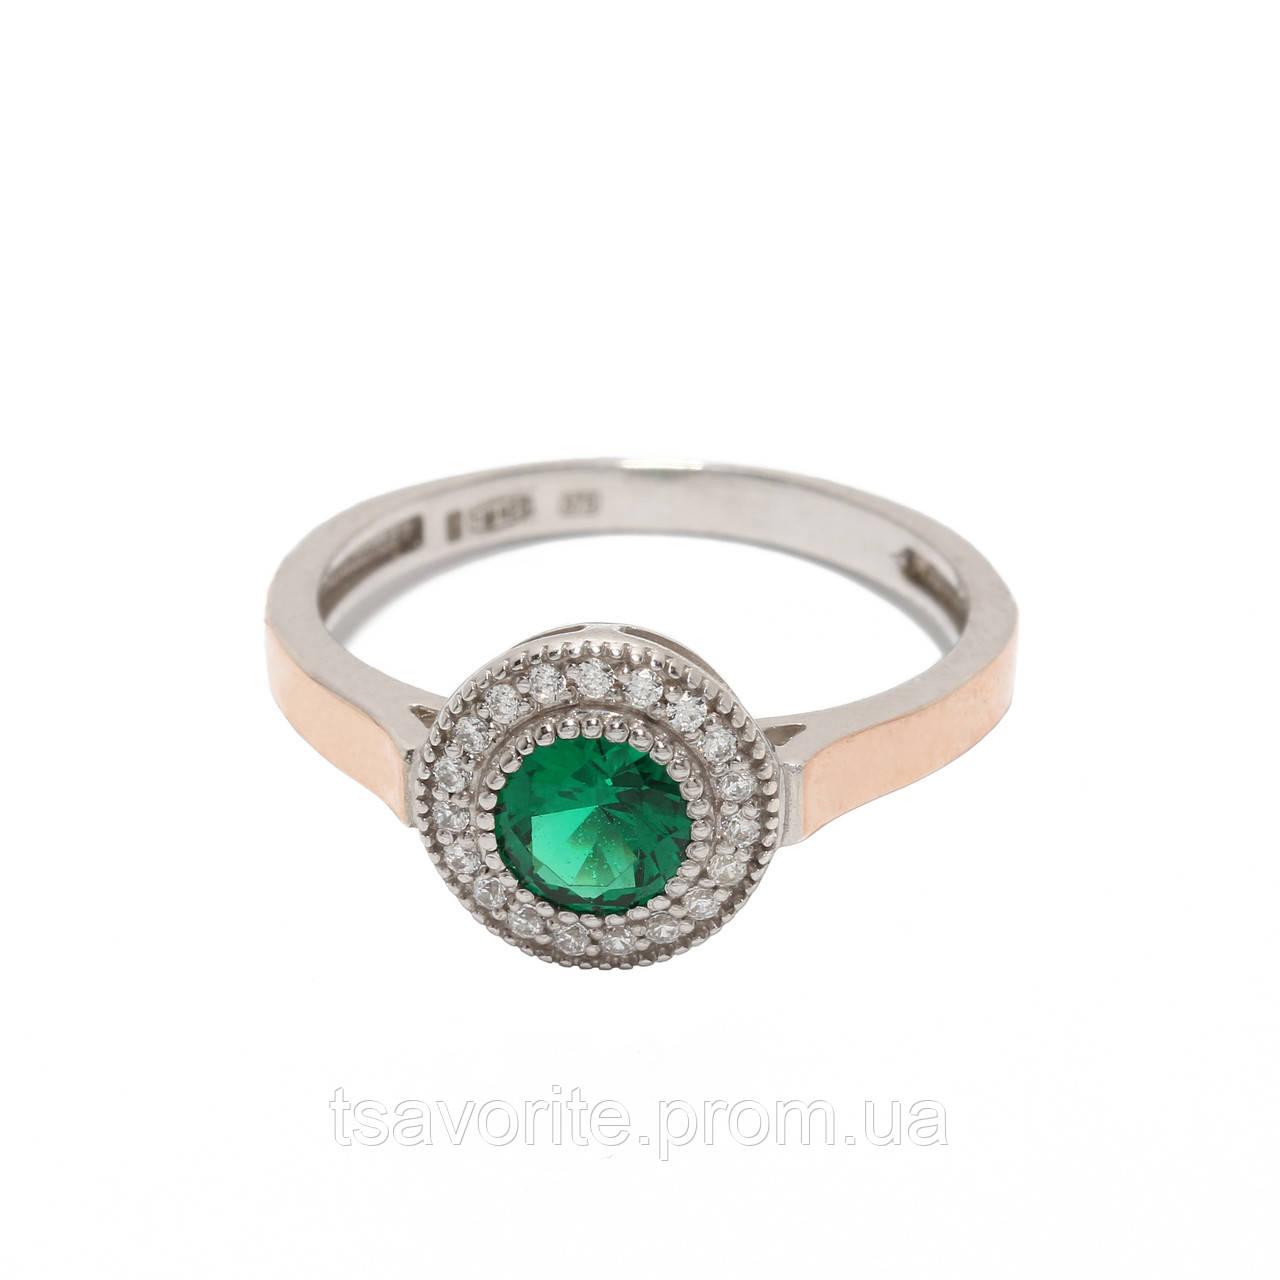 Серебряное кольцо с золотом 500424-ЗНРн.з